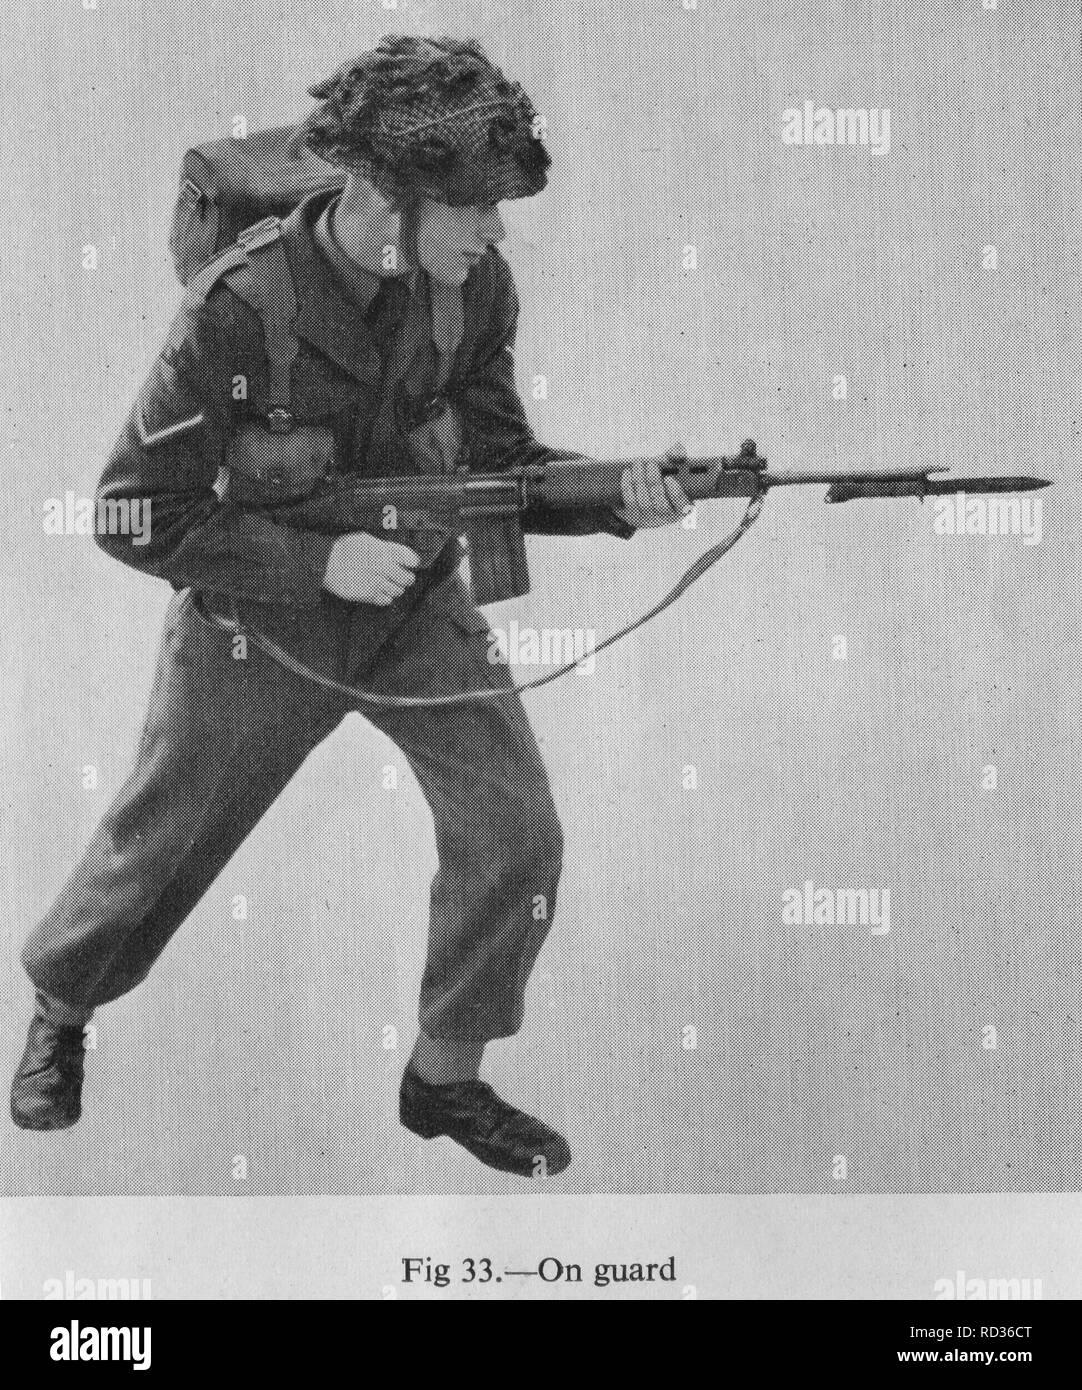 Experimental FAL rifle British army x8e1 - Stock Image